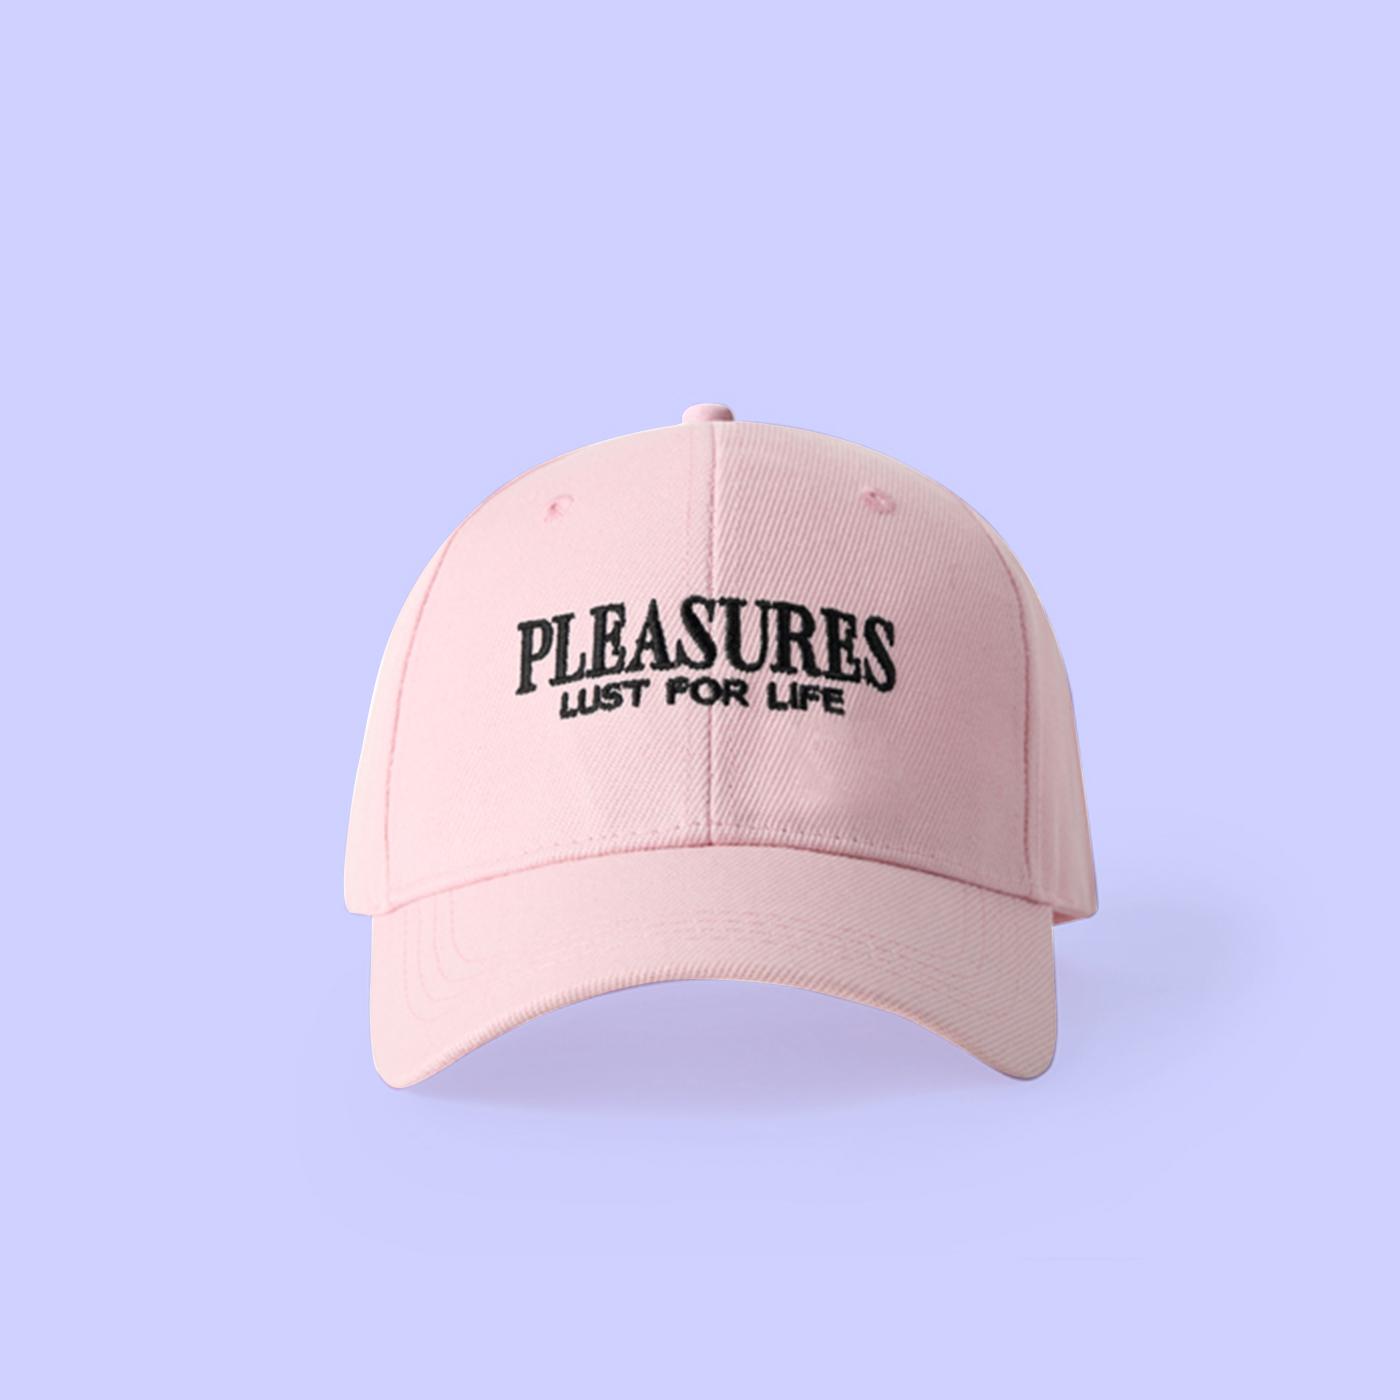 78406dea564 VAPORWAVE PLEASURES LUST FOR LIFE BASEBALL CAP IN PINK · CYBEROTAKU ...